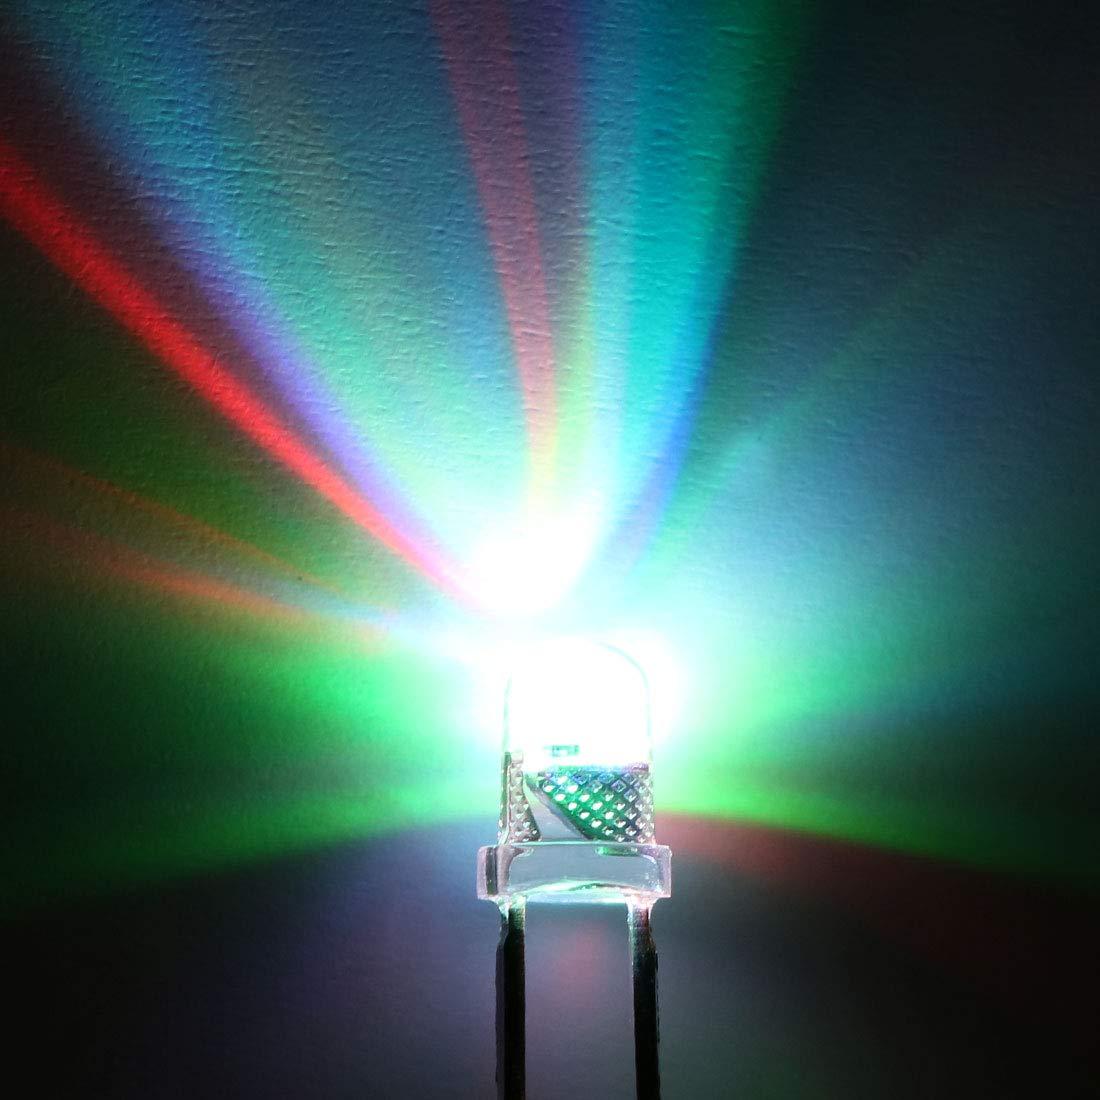 100 x 3mm round Blue LED superbright bulb lamp light